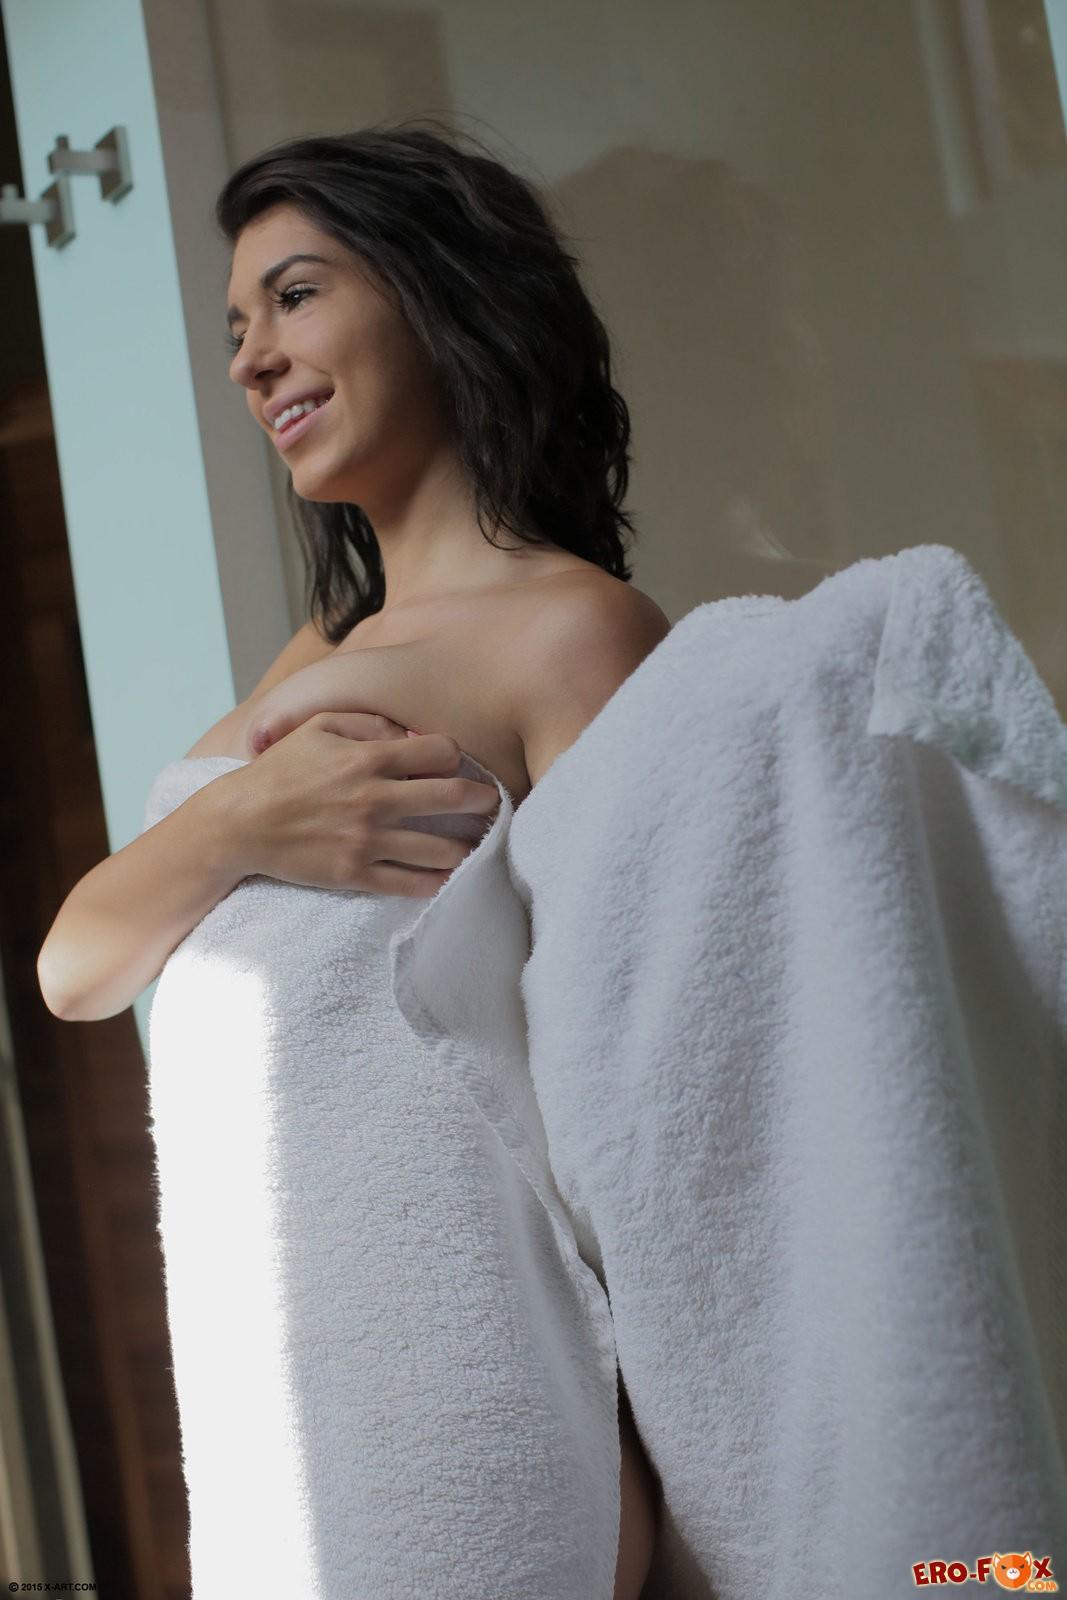 Молодая голая девушка в сауне ласкает киску .